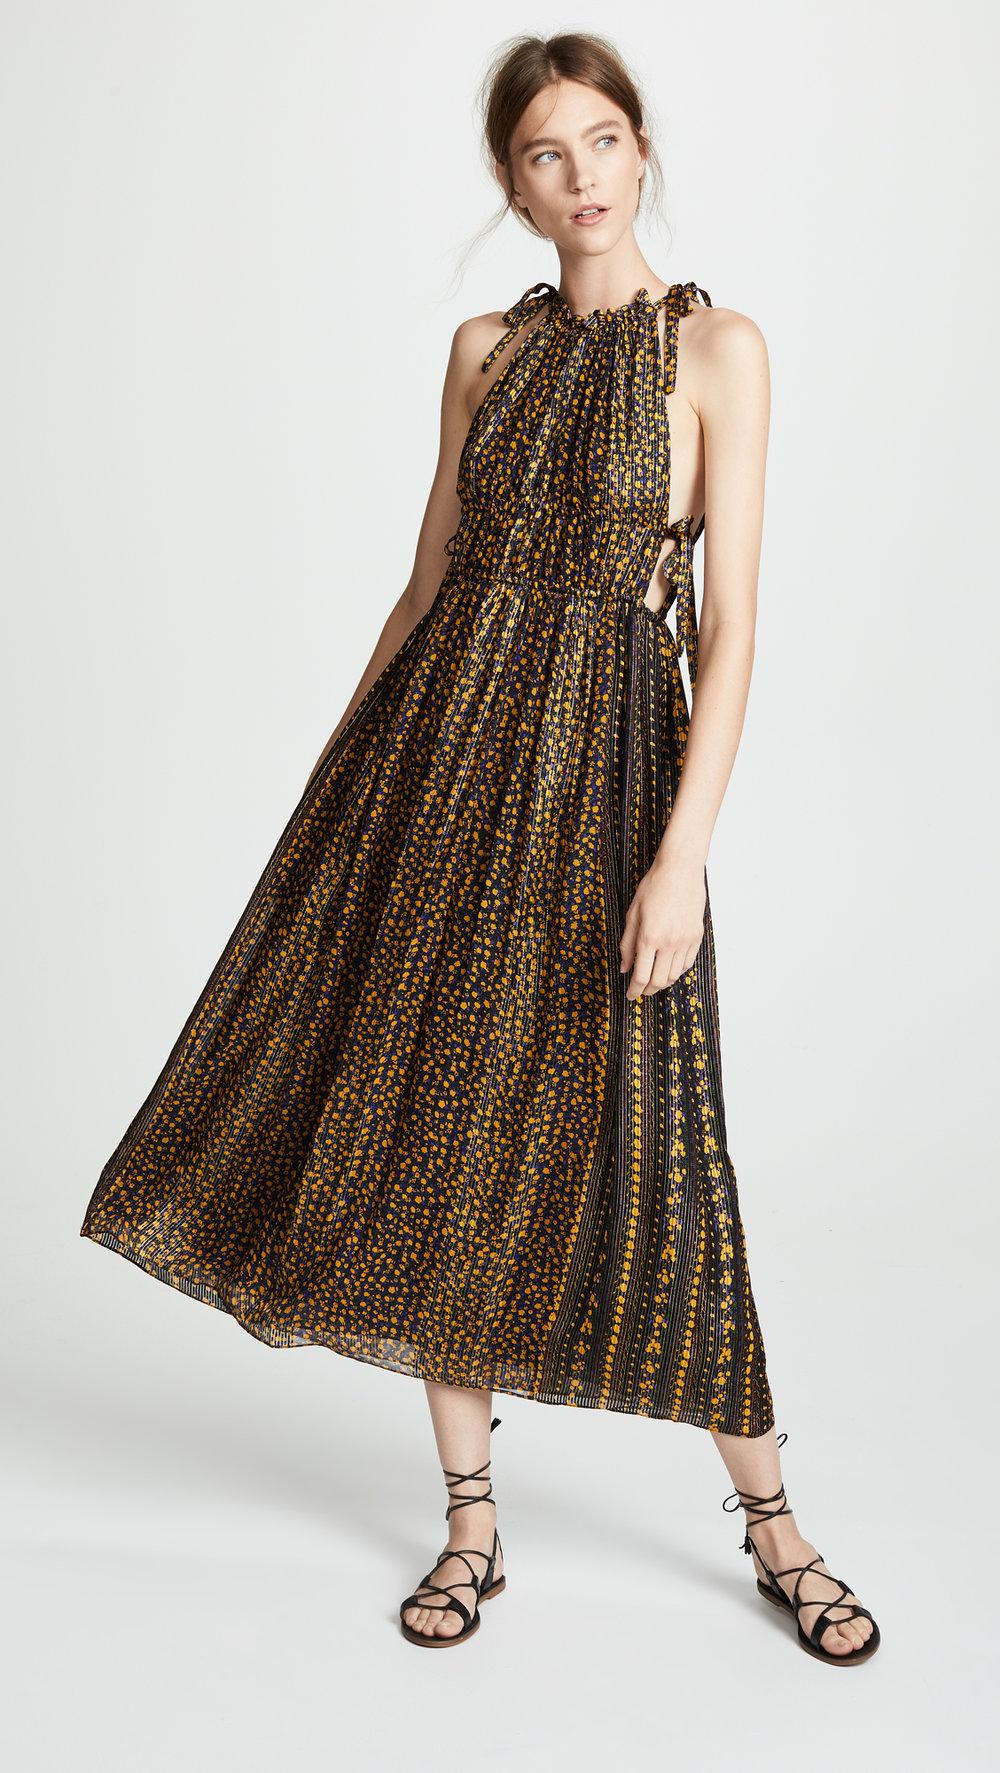 Ulla Johnson Augustine Dress